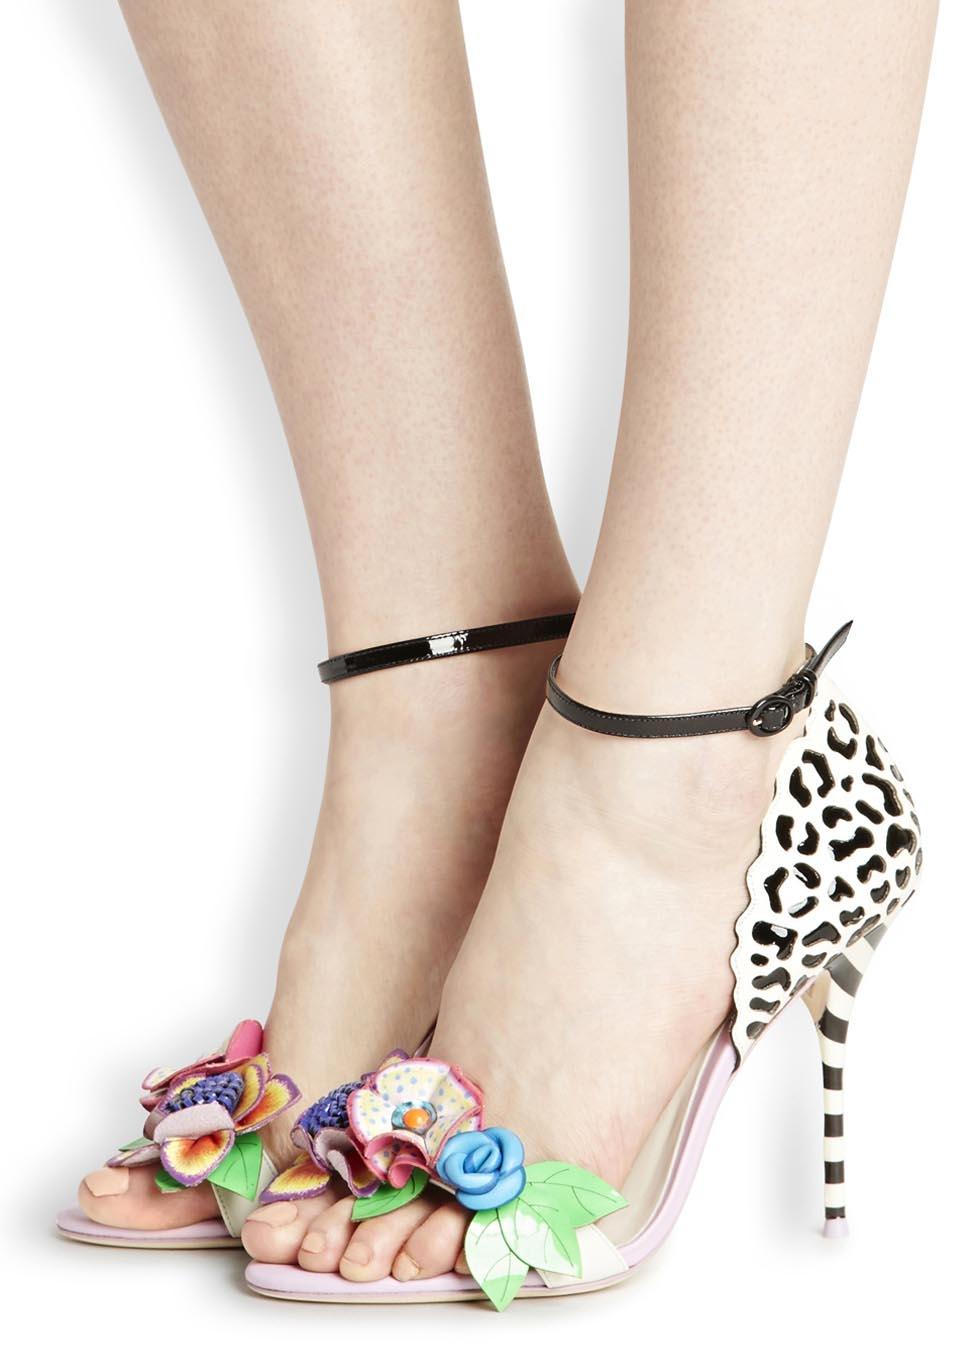 f4e84107f362 Sophia Webster Lilico Jungle Floral Appliqué Leather Sandals - Lyst